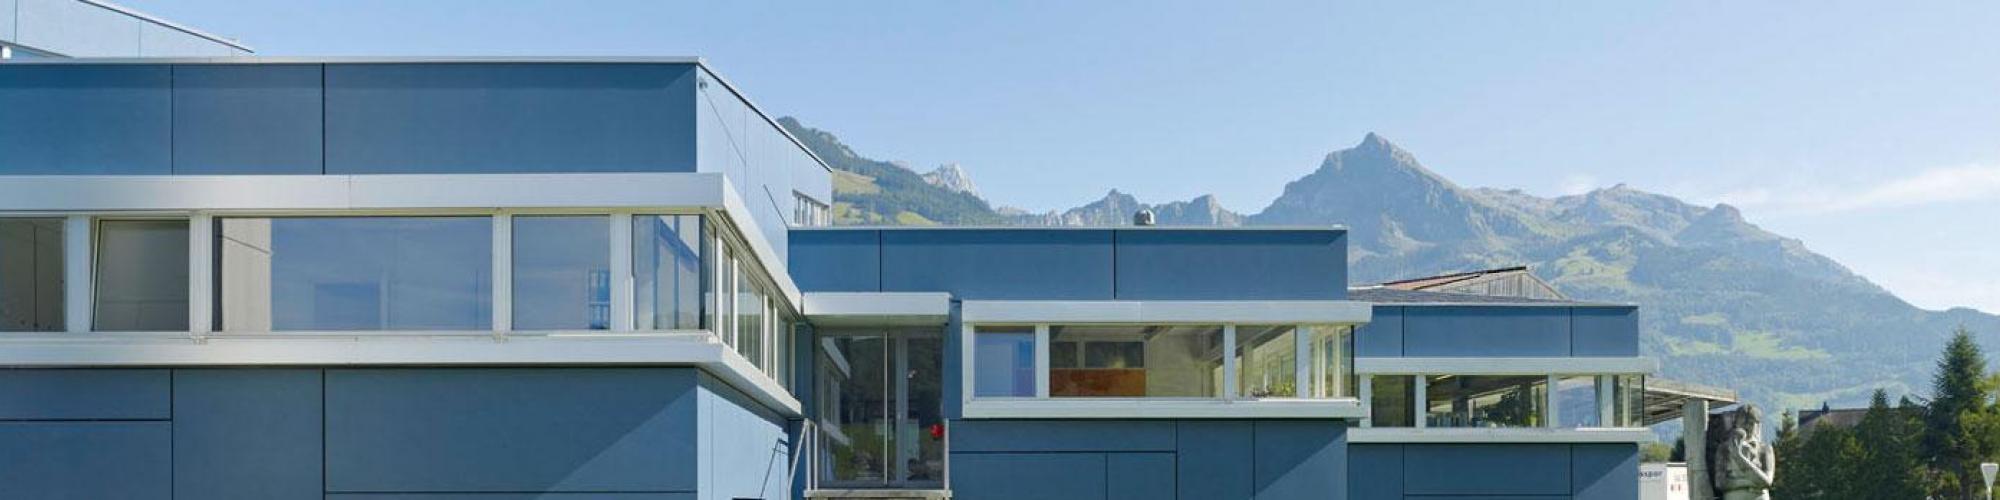 Eternit (Schweiz) AG